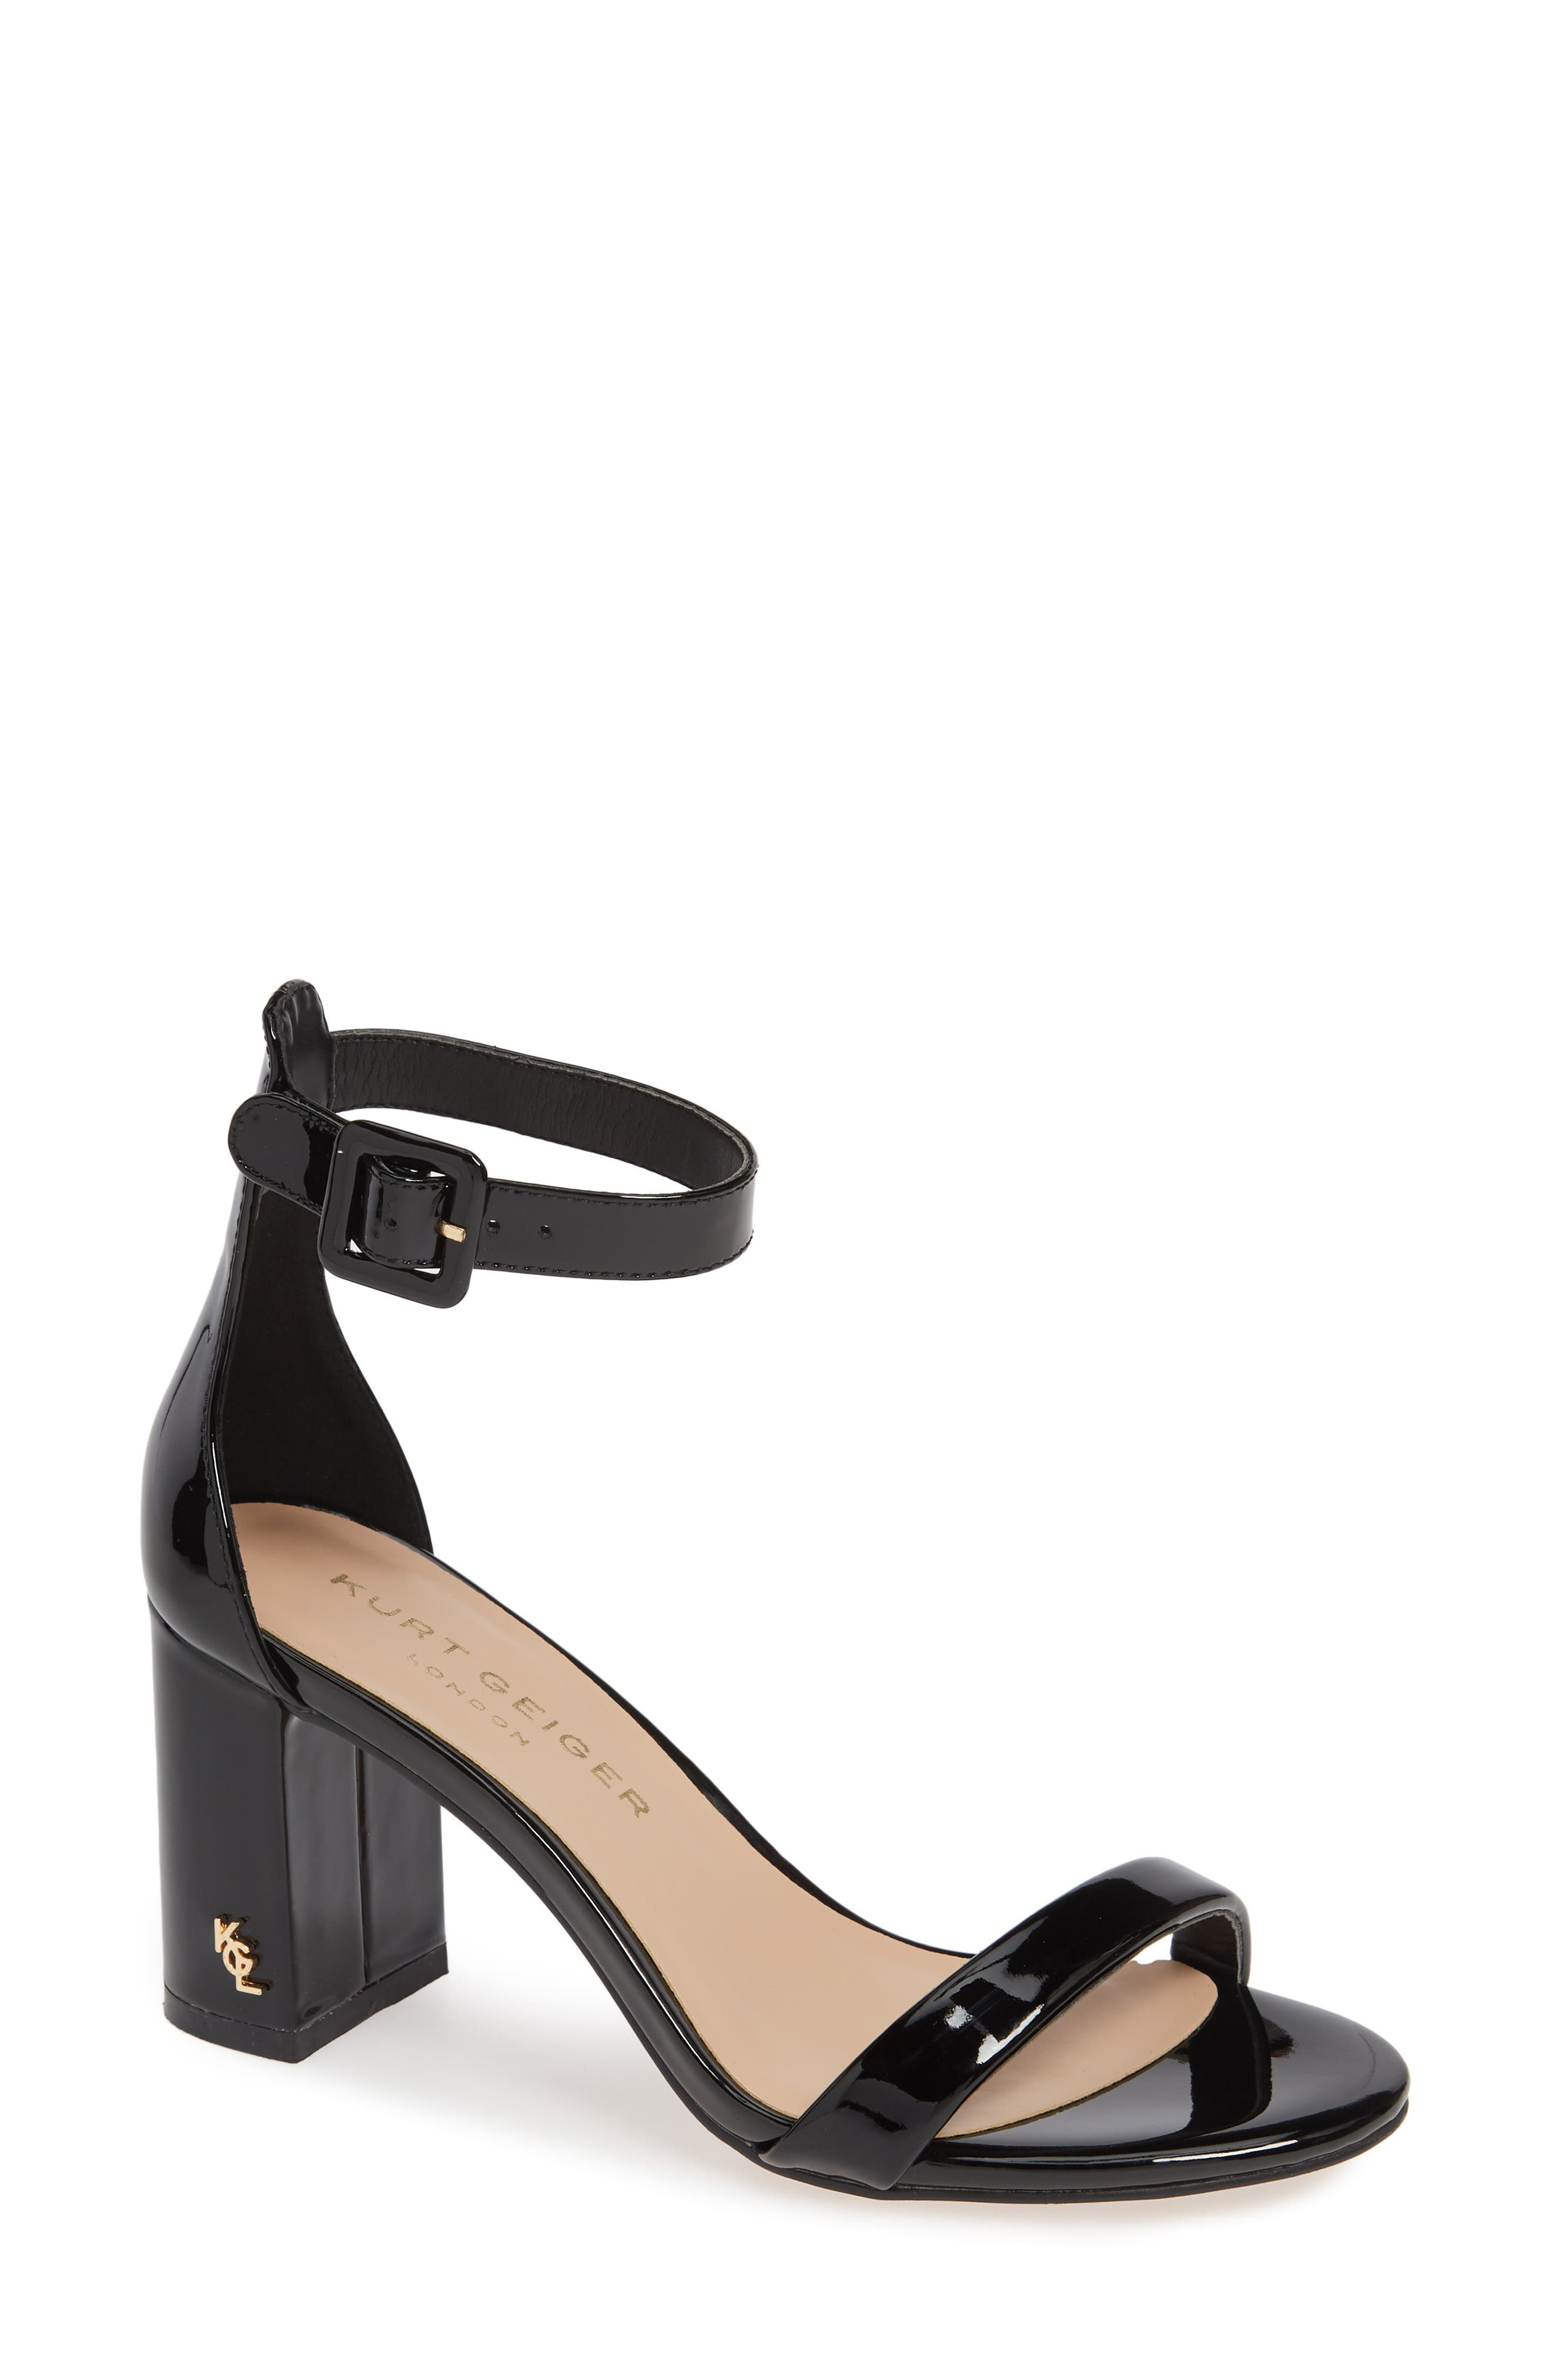 Langley Ankle Strap Sandal,                             Main thumbnail 1, color,                             BLACK LEATHER